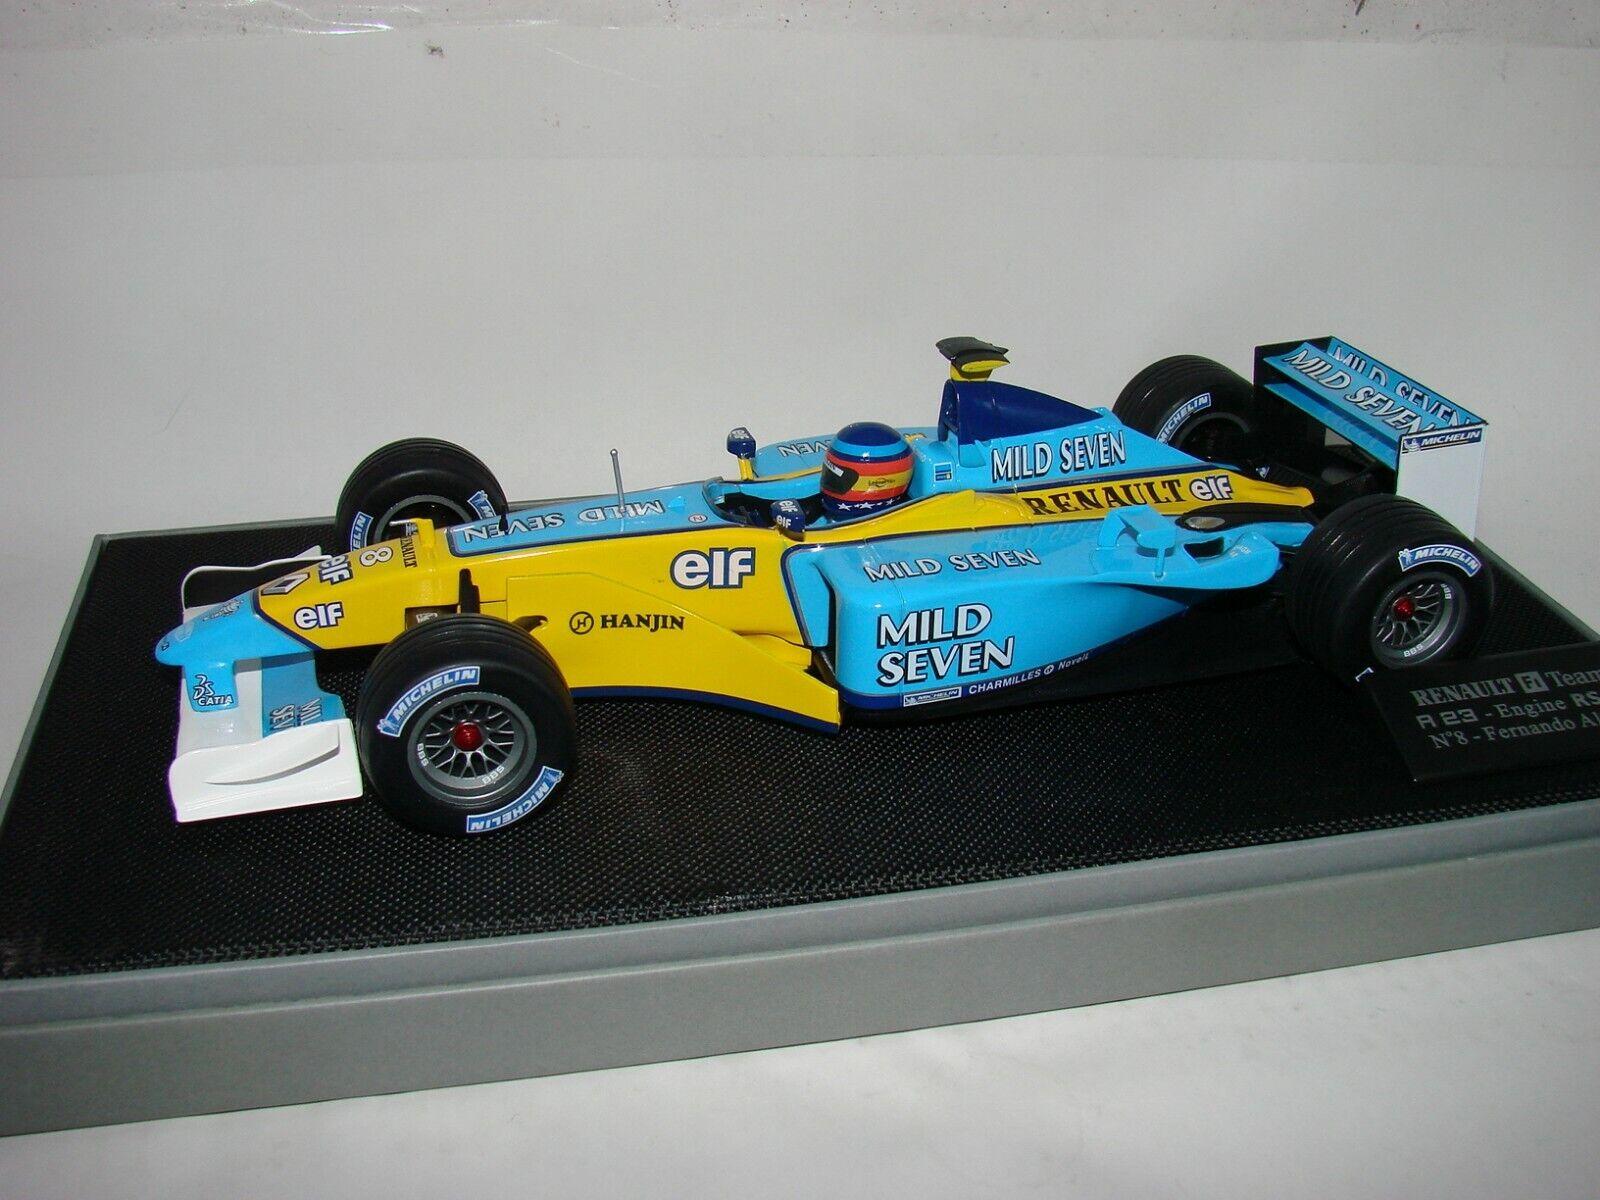 1 18 Fernando Alonso F1 - 2003, Renault F1 Caja R23 RS23 con Tabak, menta en caja, Raro